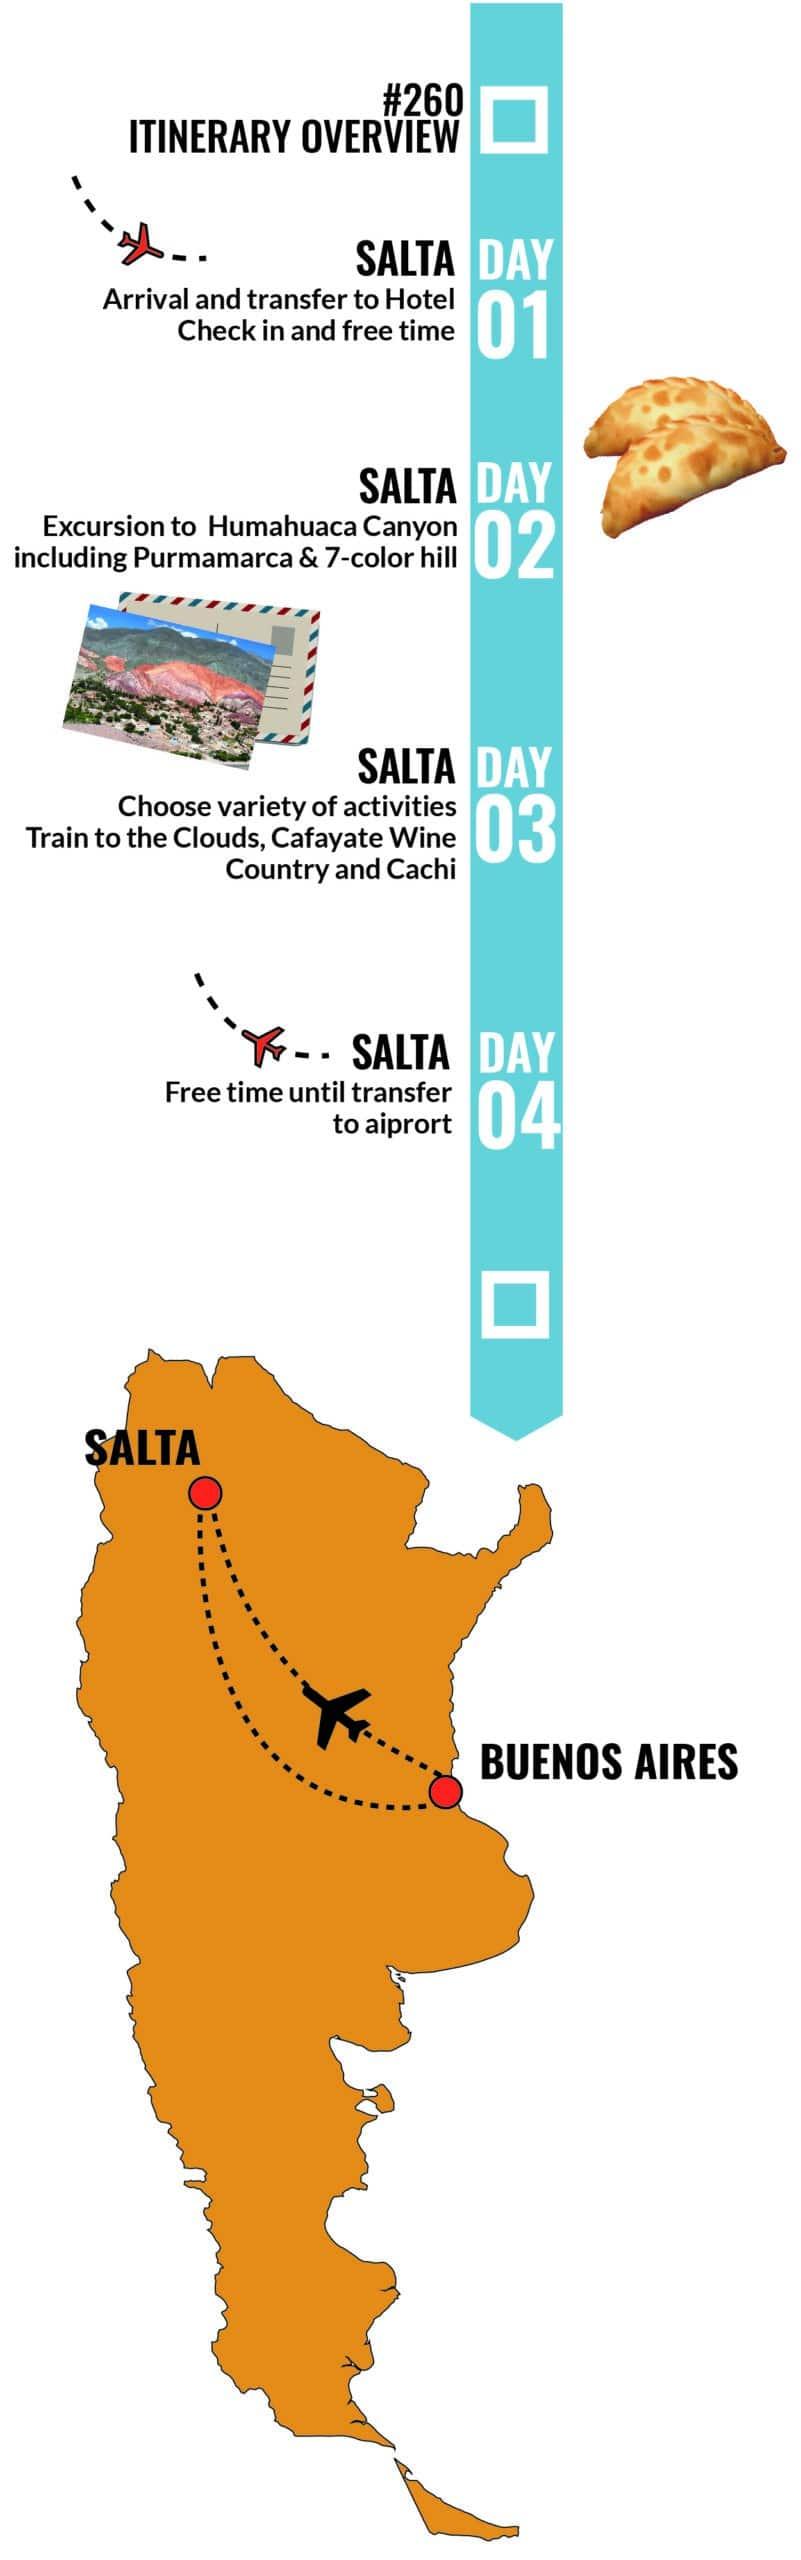 Salta basic Program by RipioTurismo Incoming tour Operator Argentina DMC